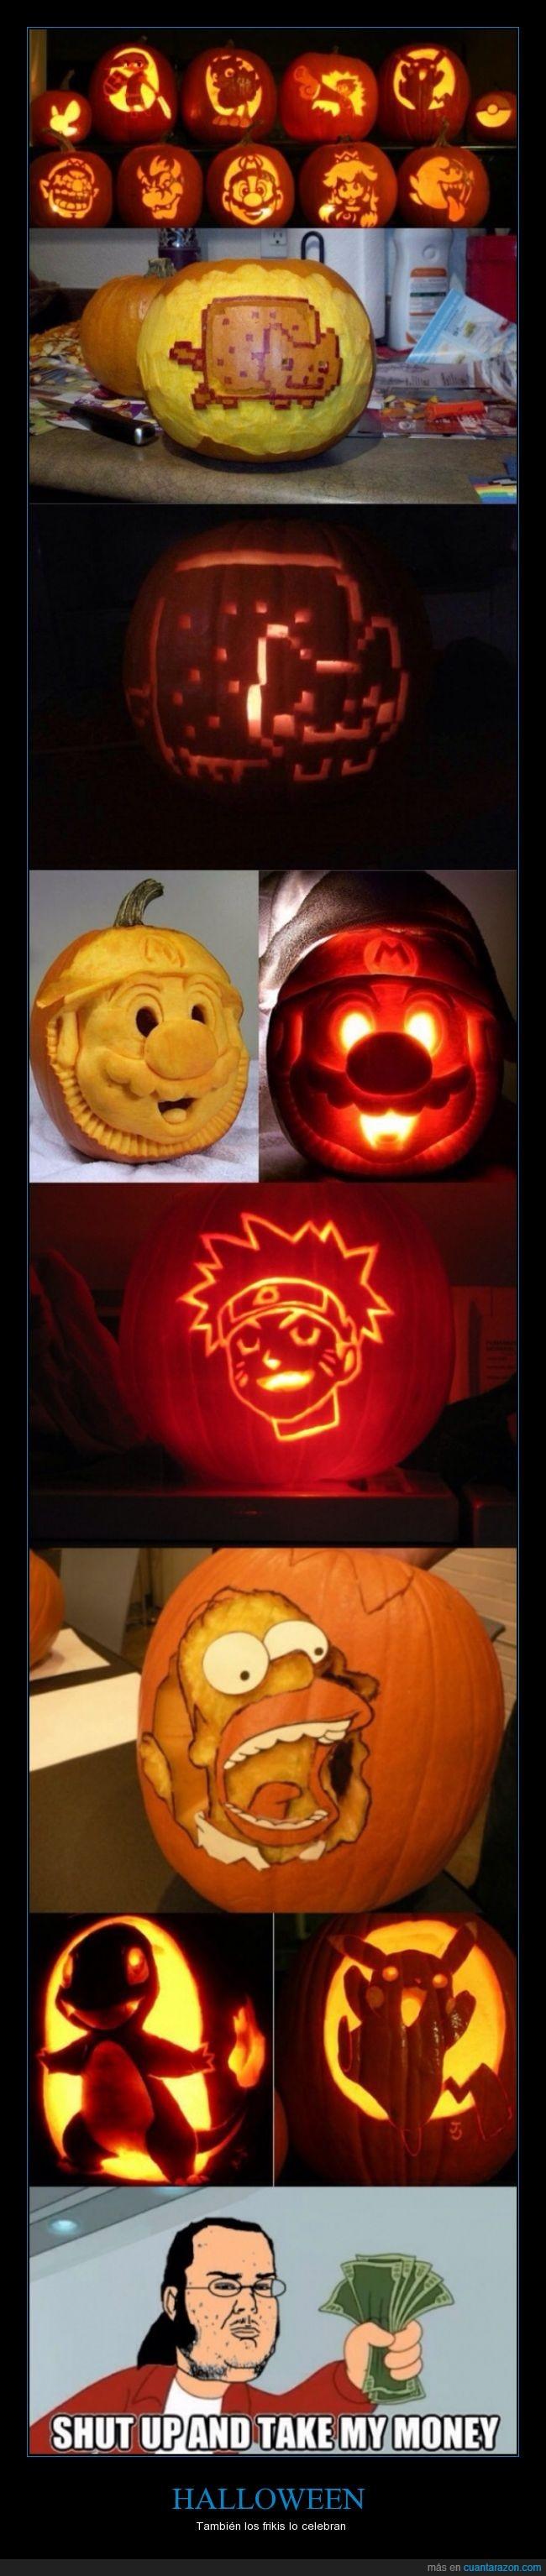 calabaza,frikis,Halloween,homer,mario,naruto,pokemon,tallar